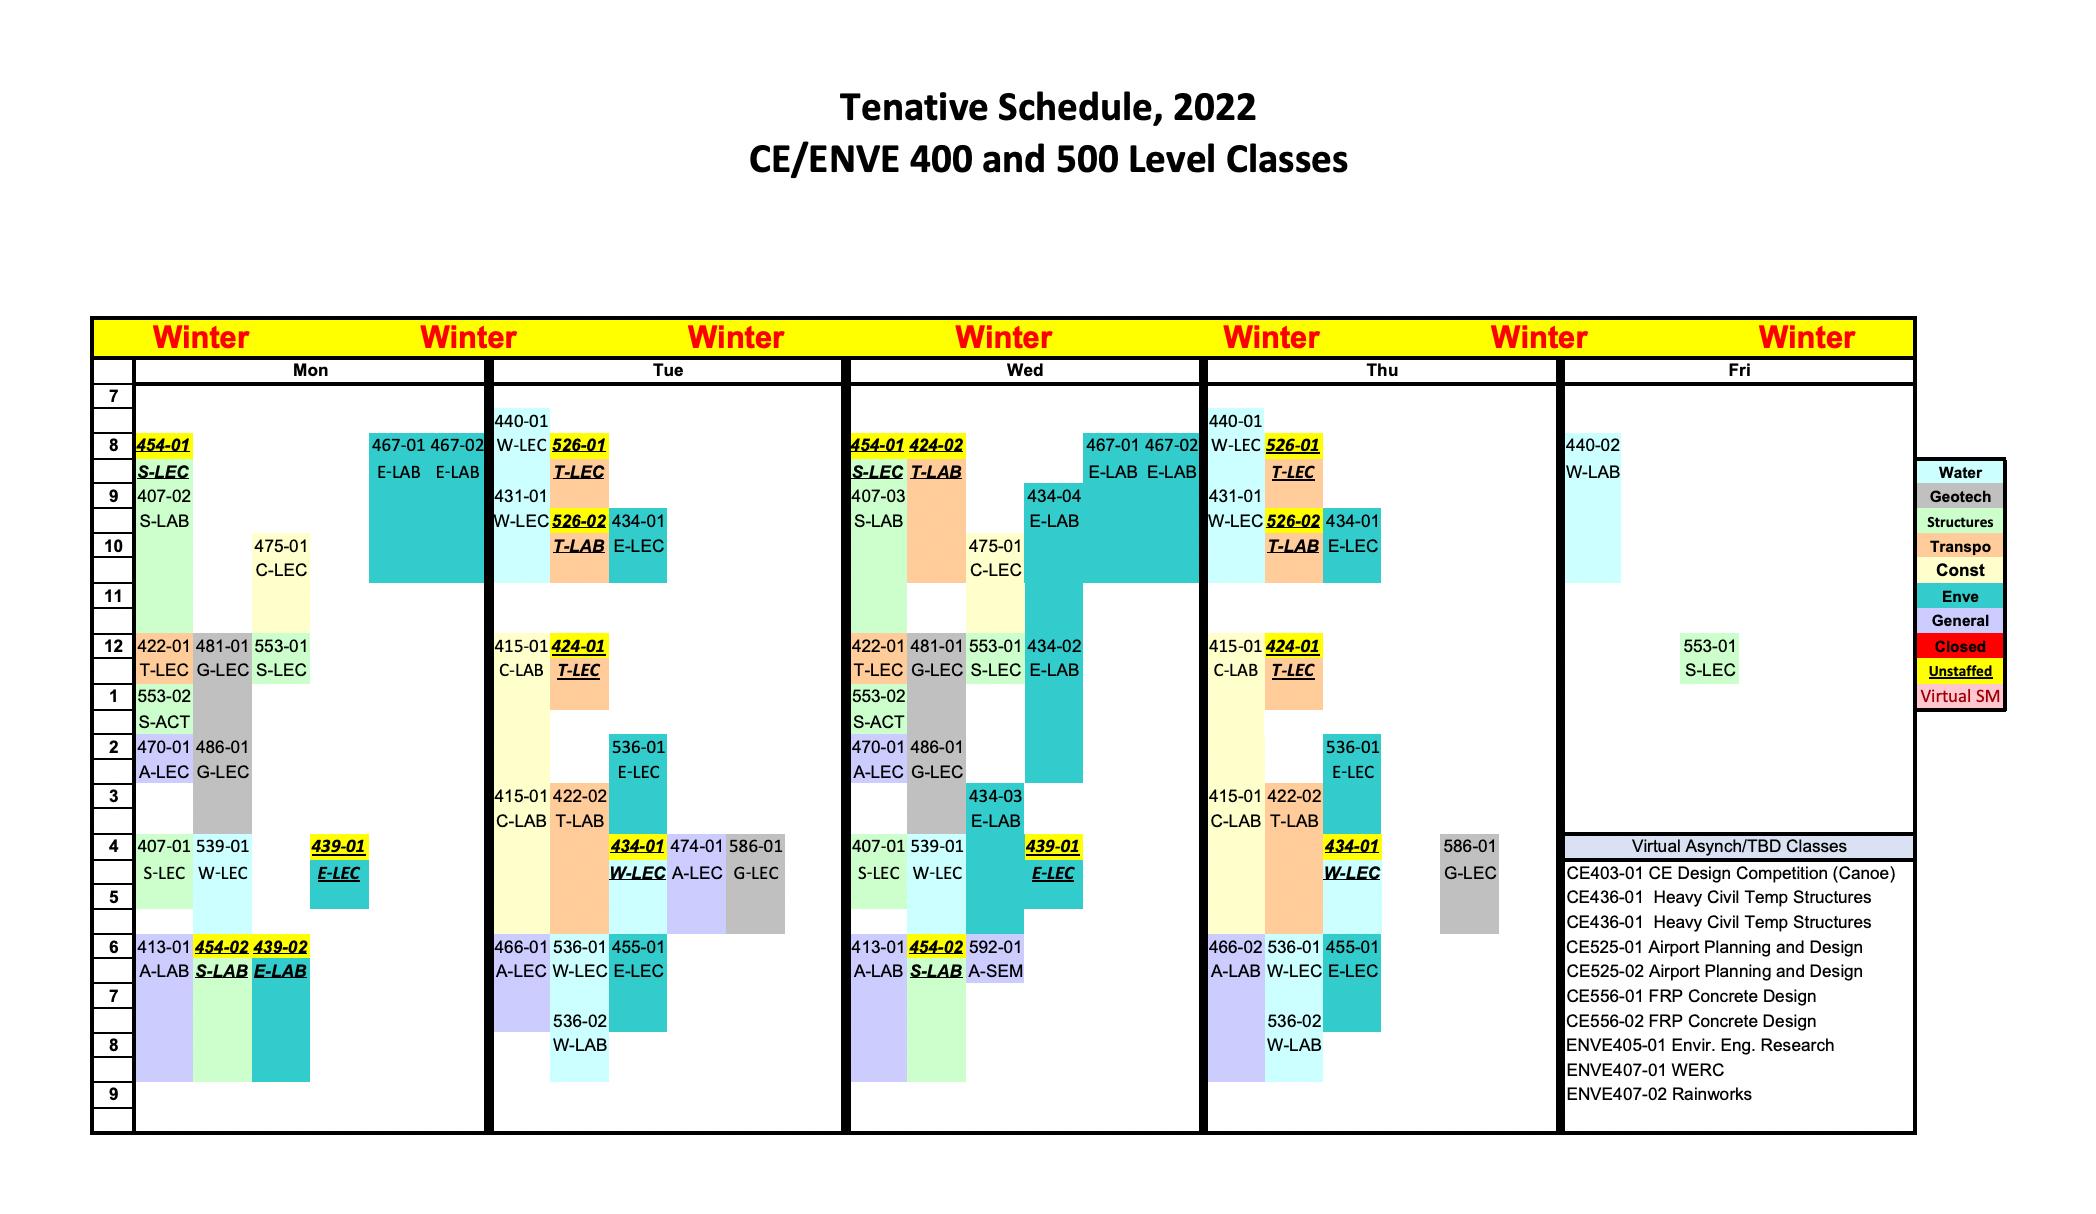 Winter - CE/ENVE 400 and 500 Level Courses